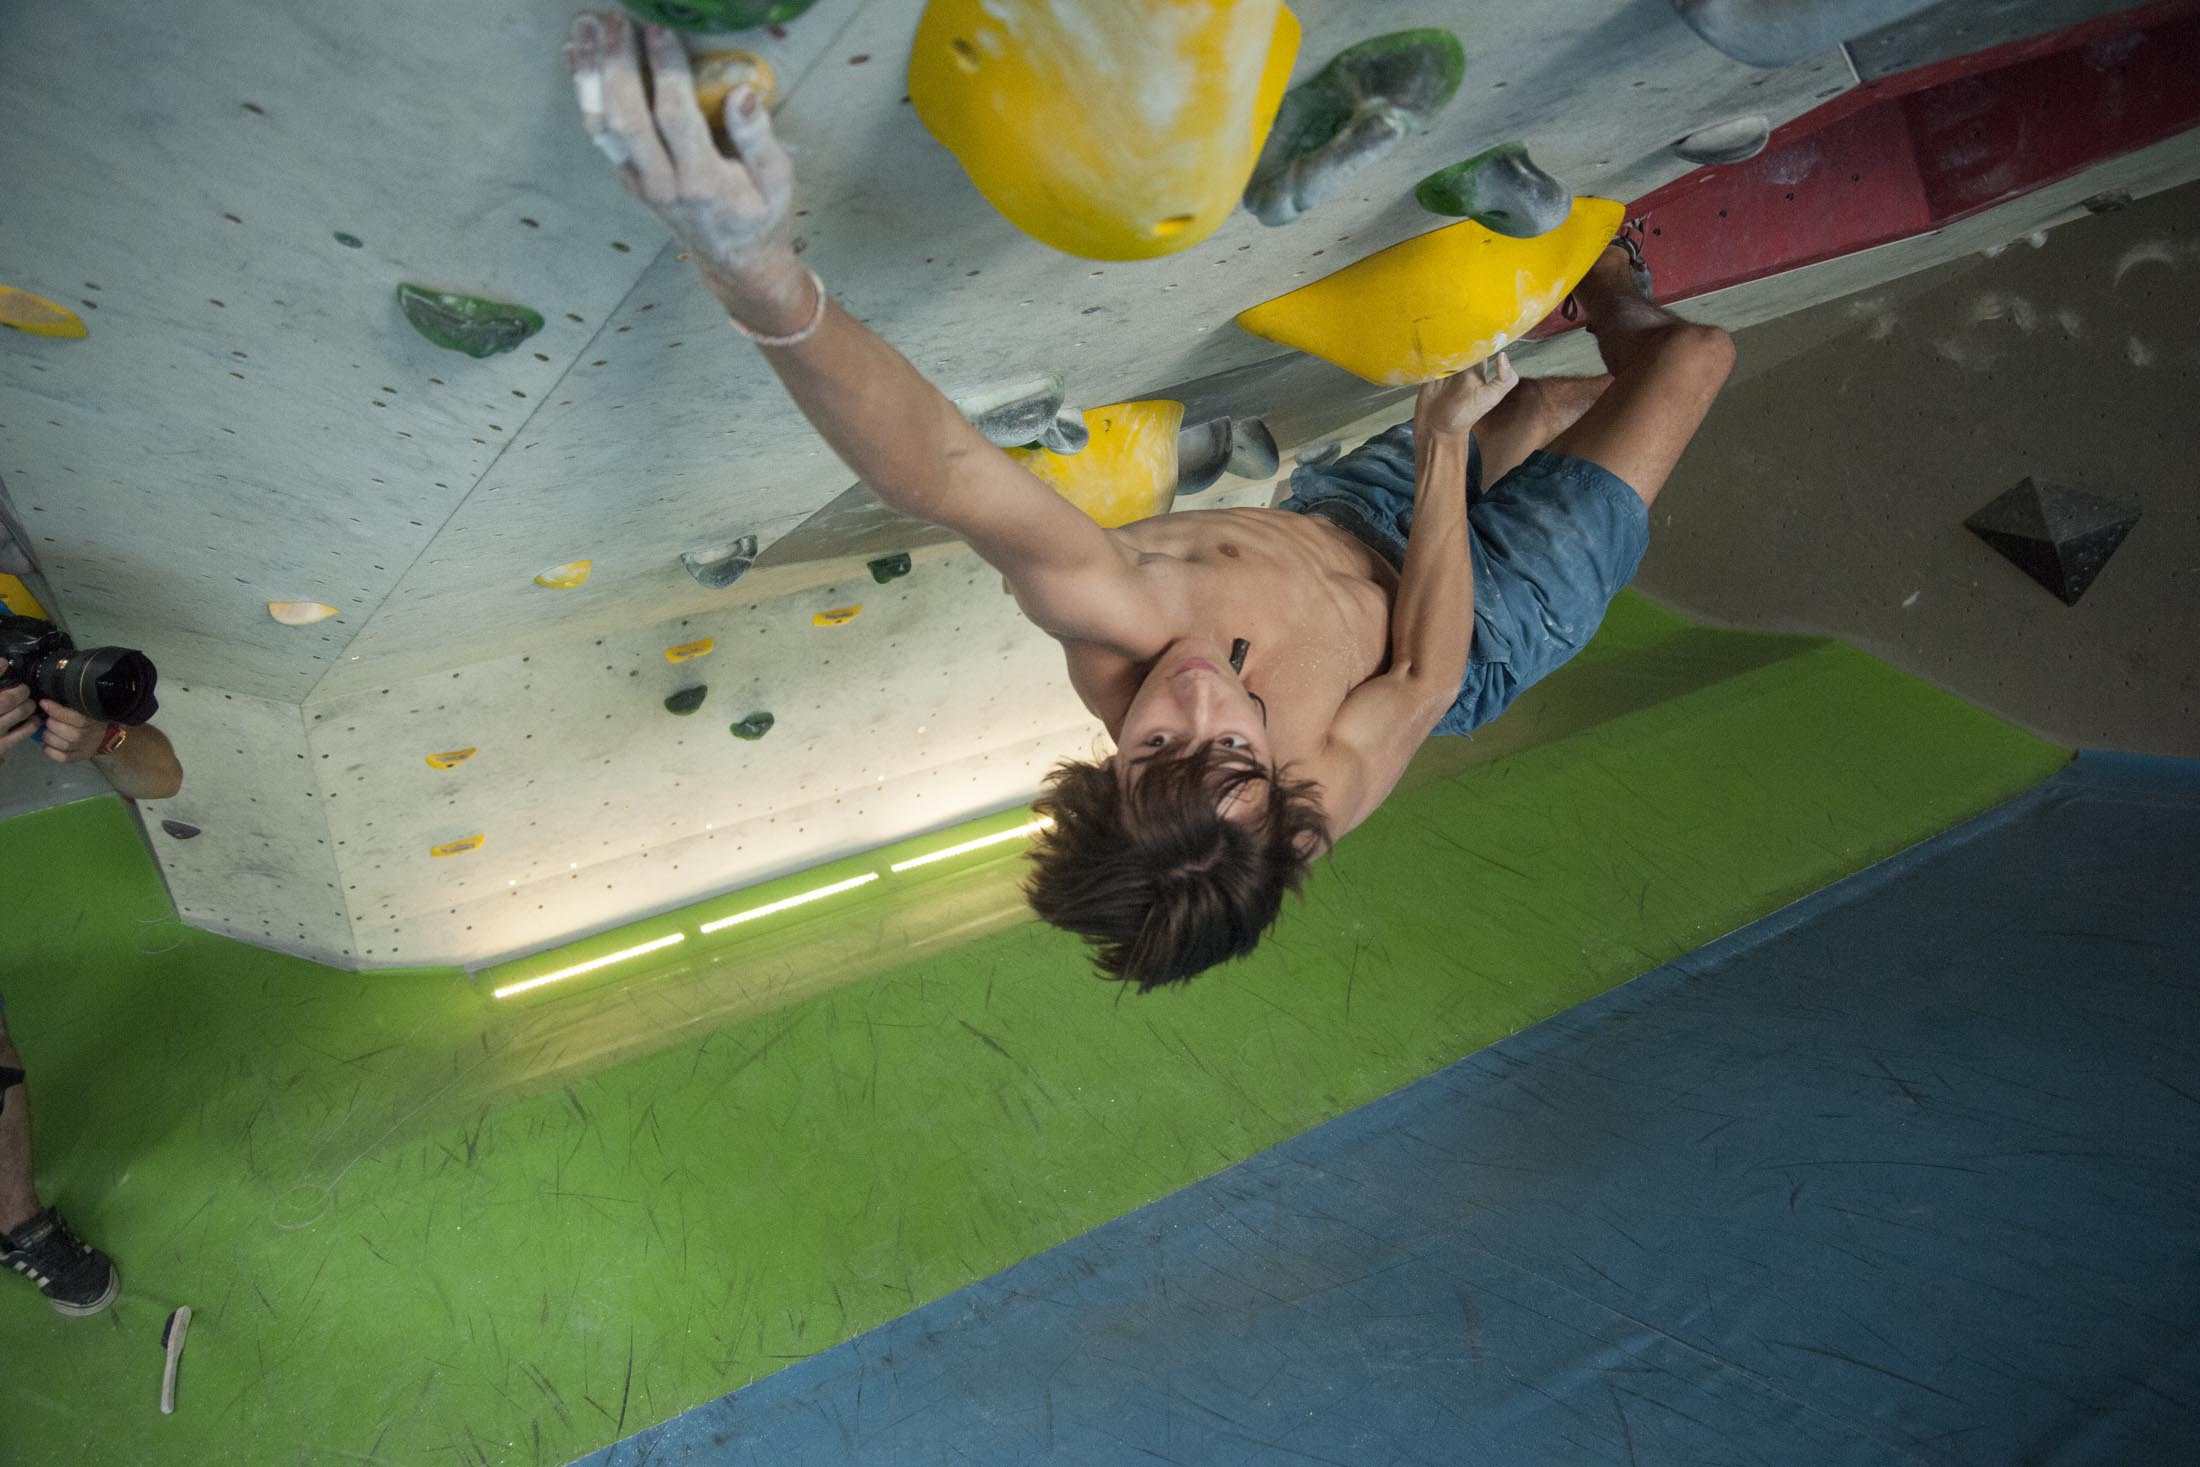 Quali, internationaler bouldercup Frankenjura 2016, BLOCKHELDEN Erlangen, Mammut, Bergfreunde.de, Boulderwettkampf07092016258